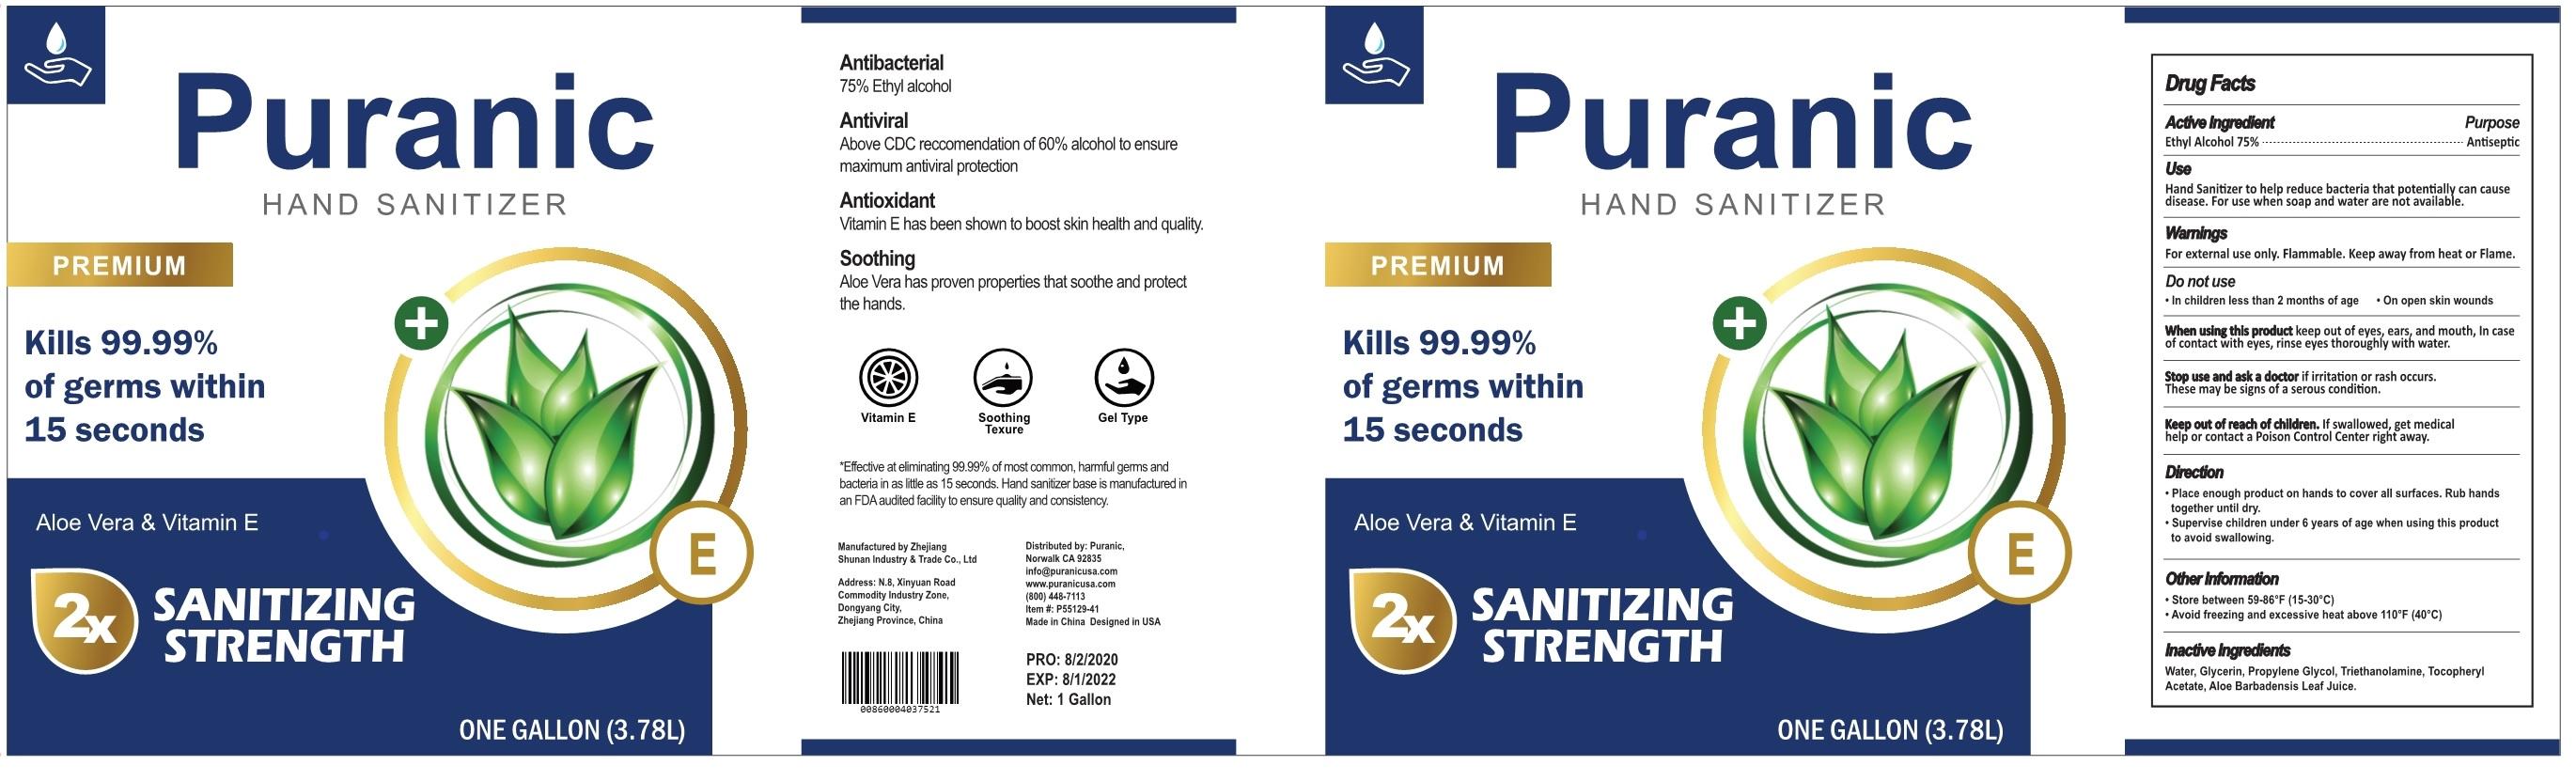 3780 ml label